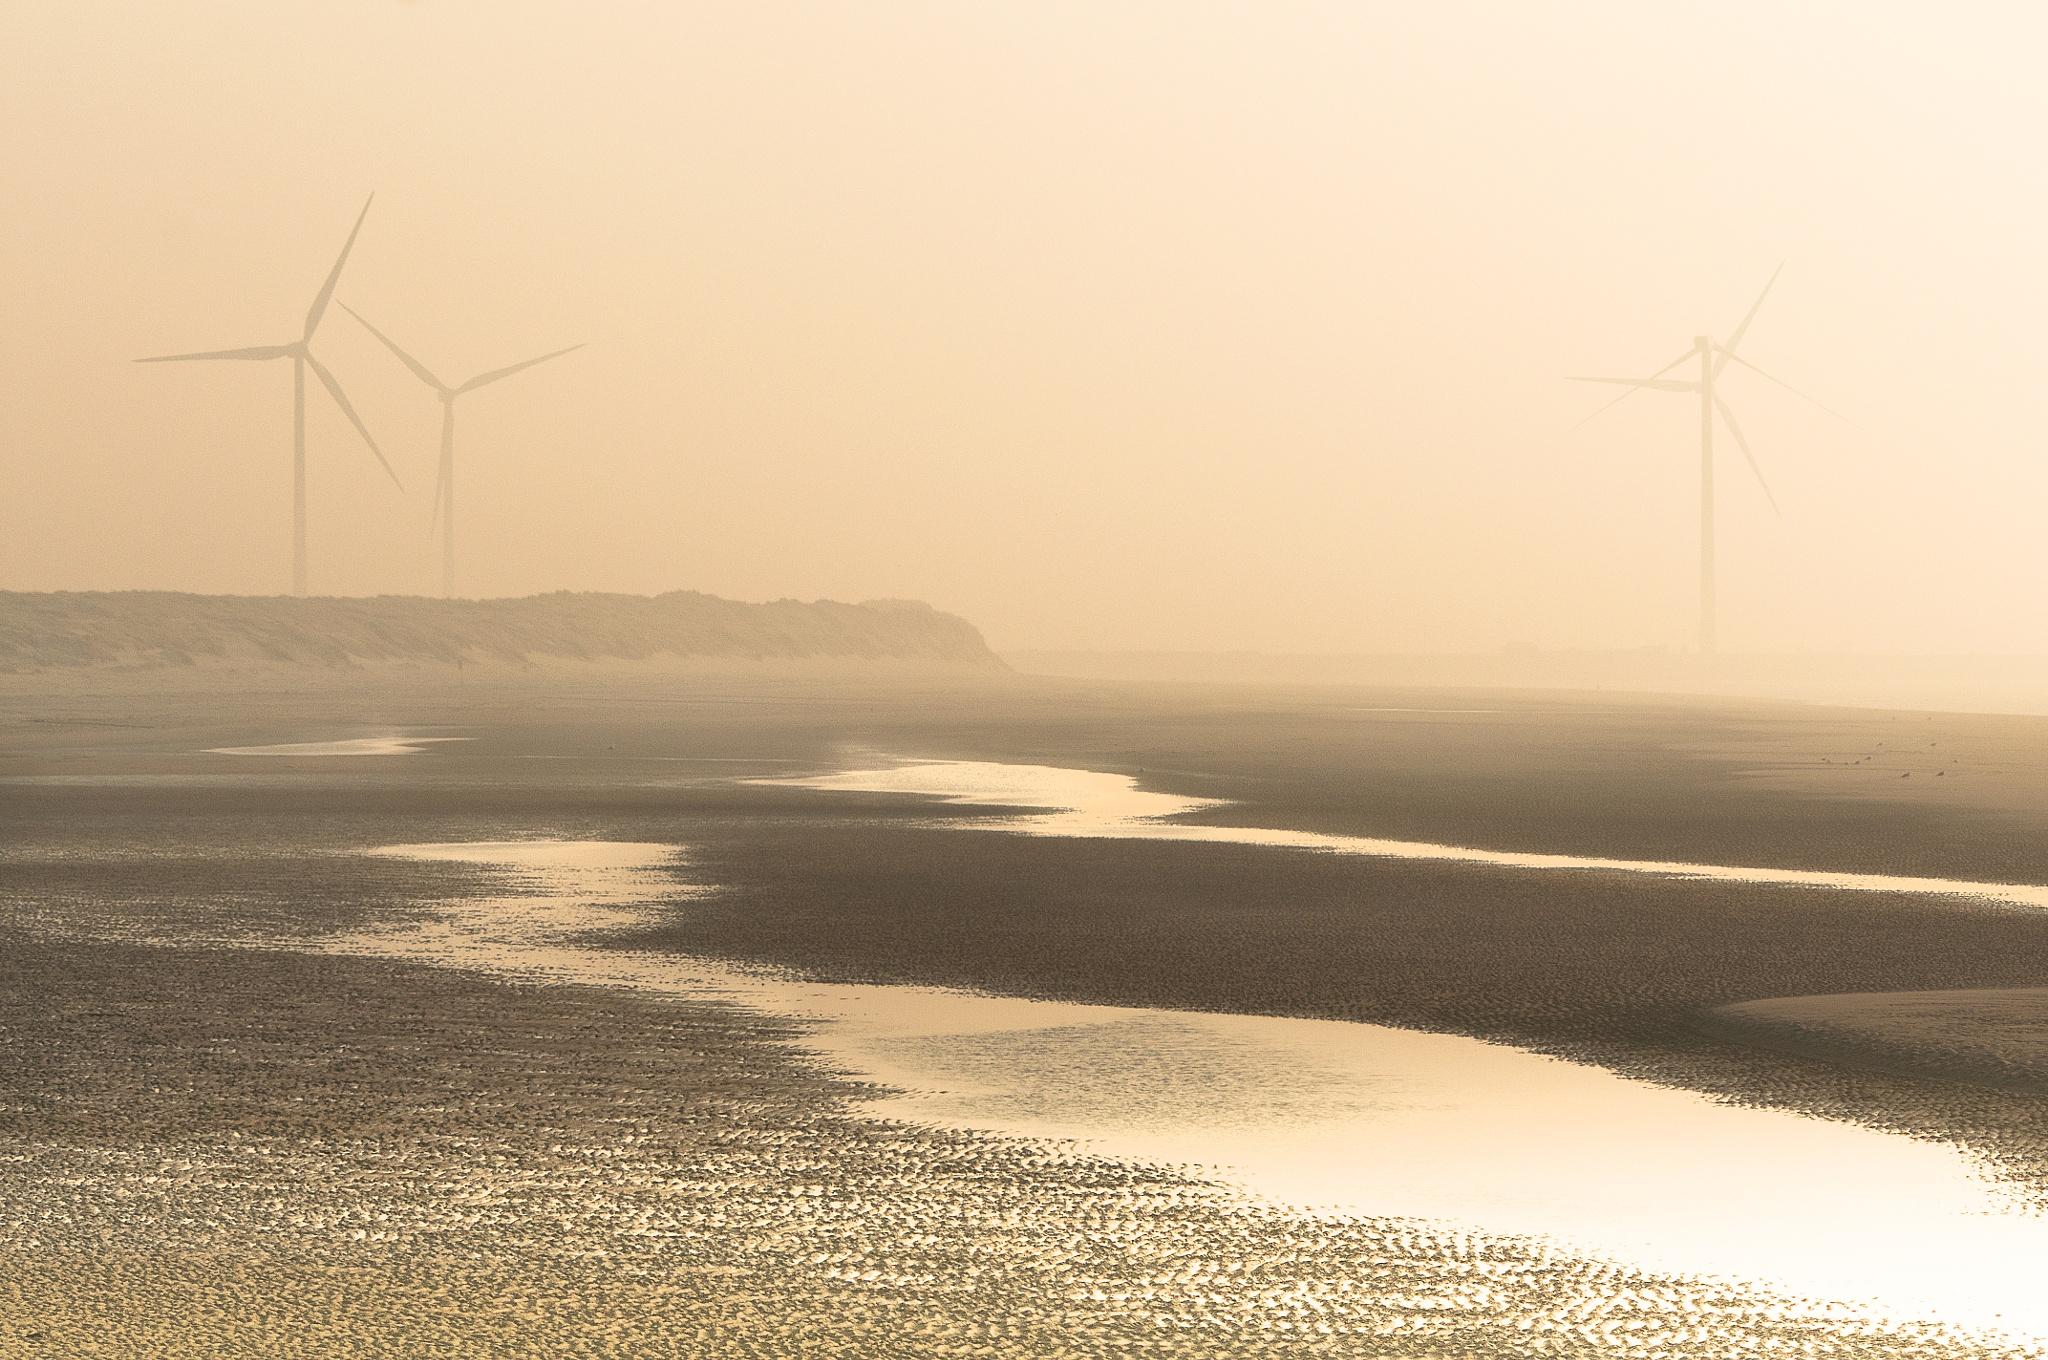 Foggy day at the beach http://sonjapixels.werkaandemuur.nl by Sonja Pixels